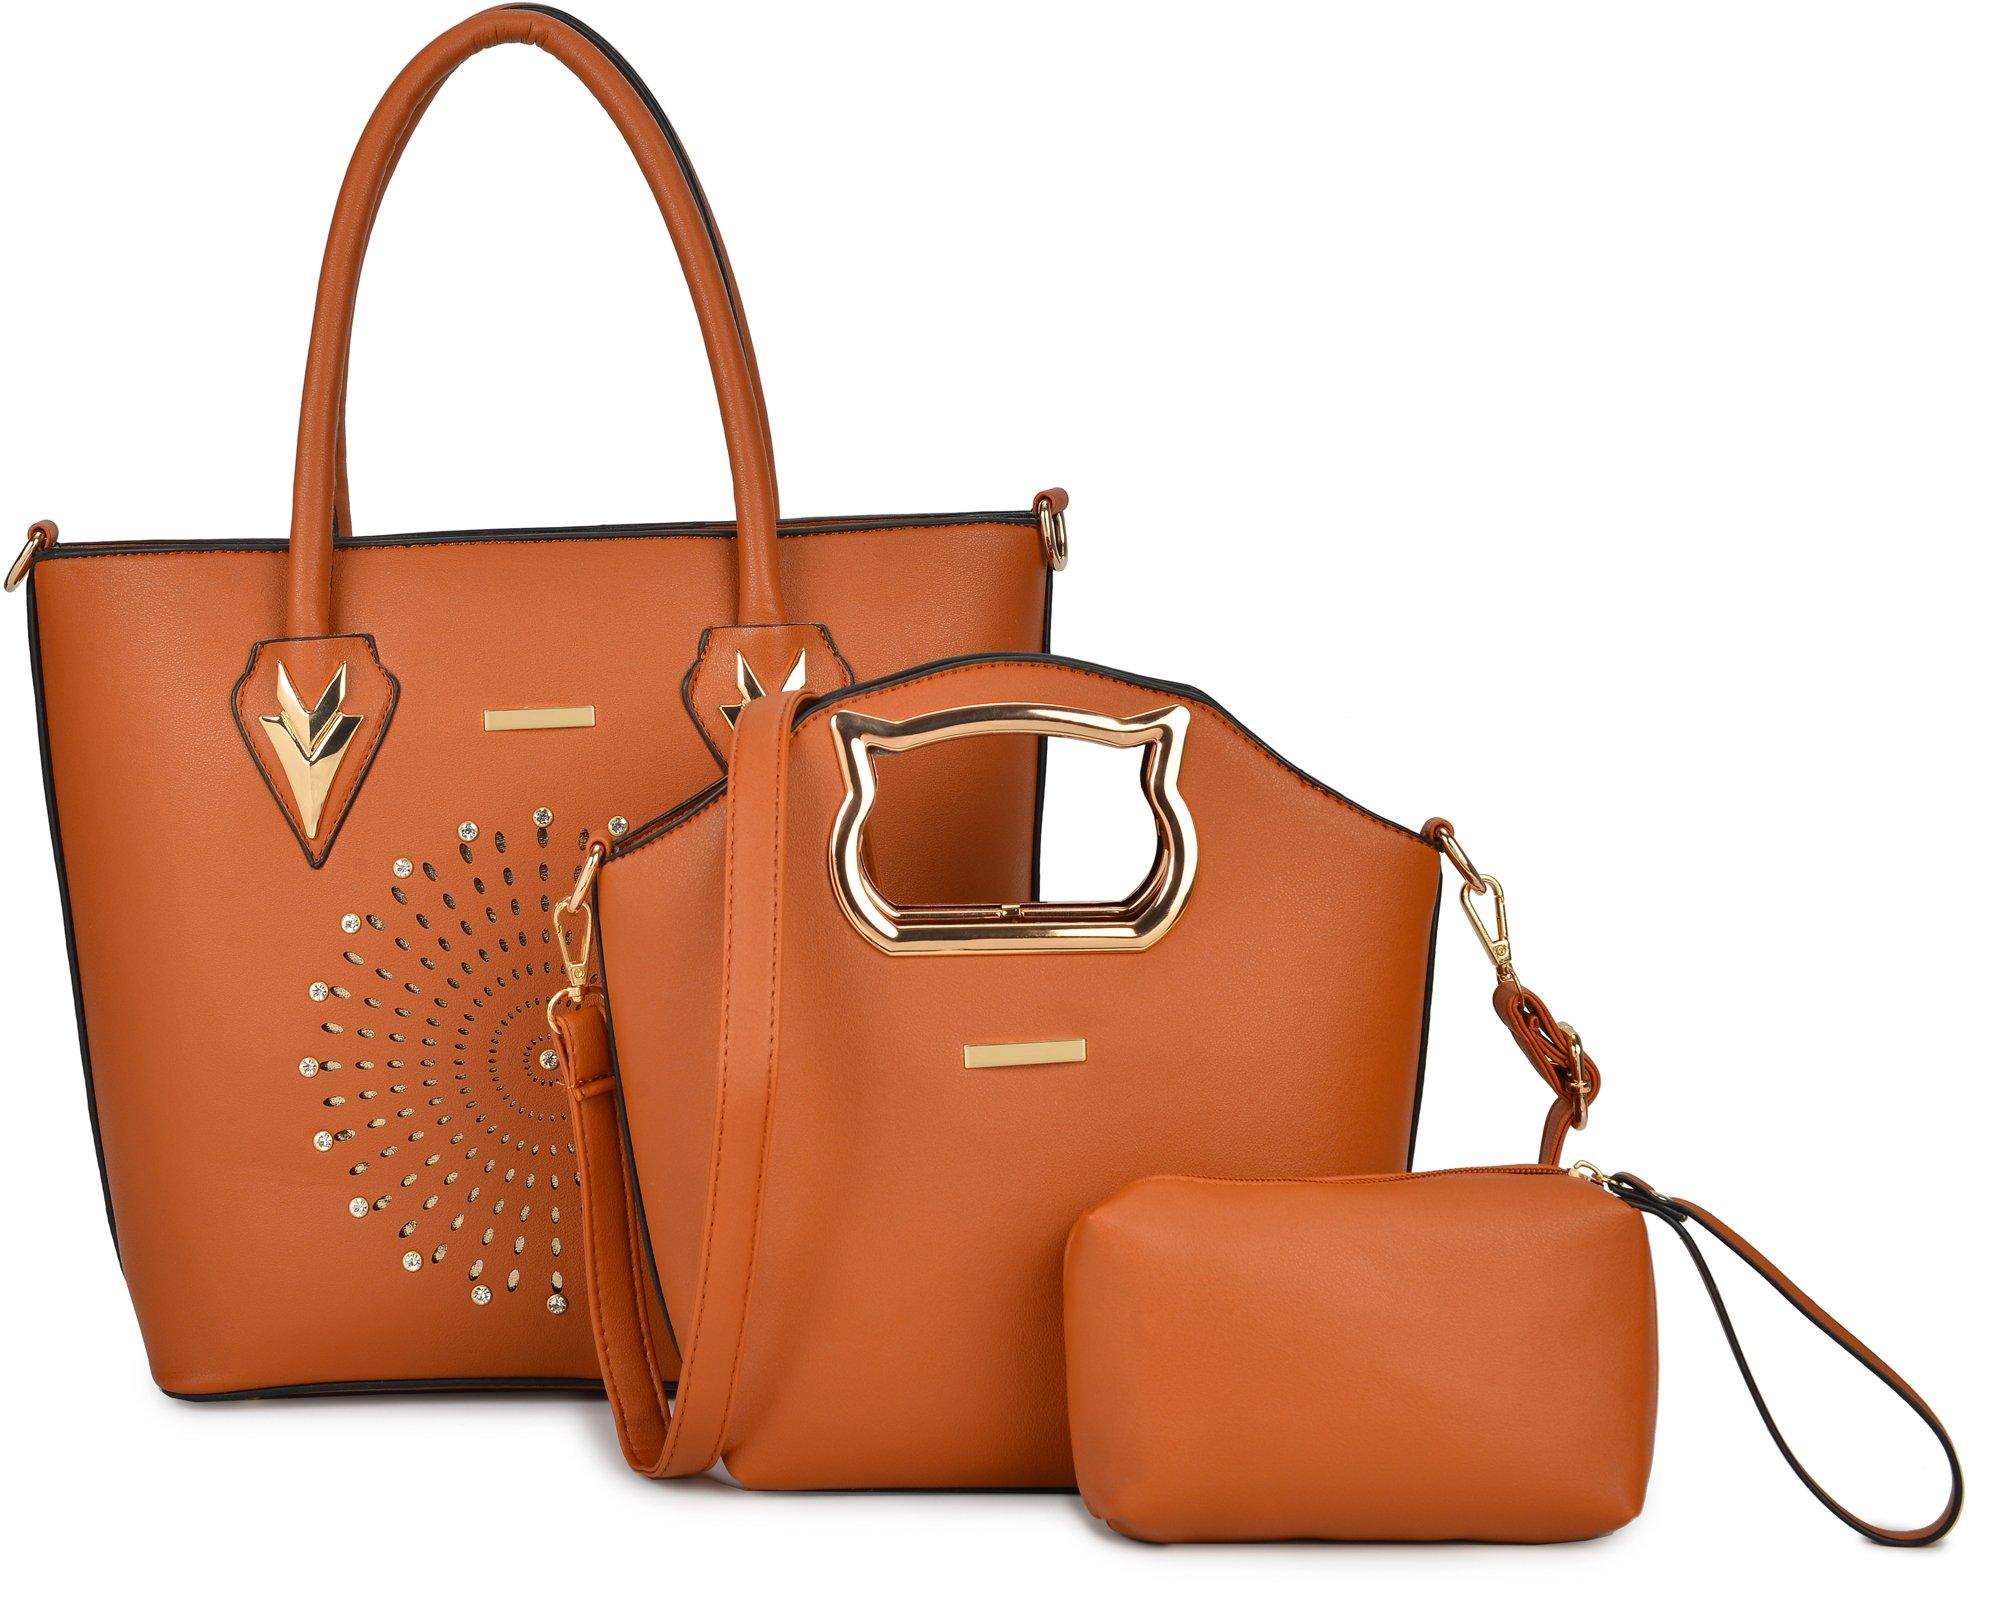 Women Handbag Purse Hobo Faux Leather Messenger Bag Clutch Satchel Bag 3 Piece Gift Set by KasPala (Image #1)